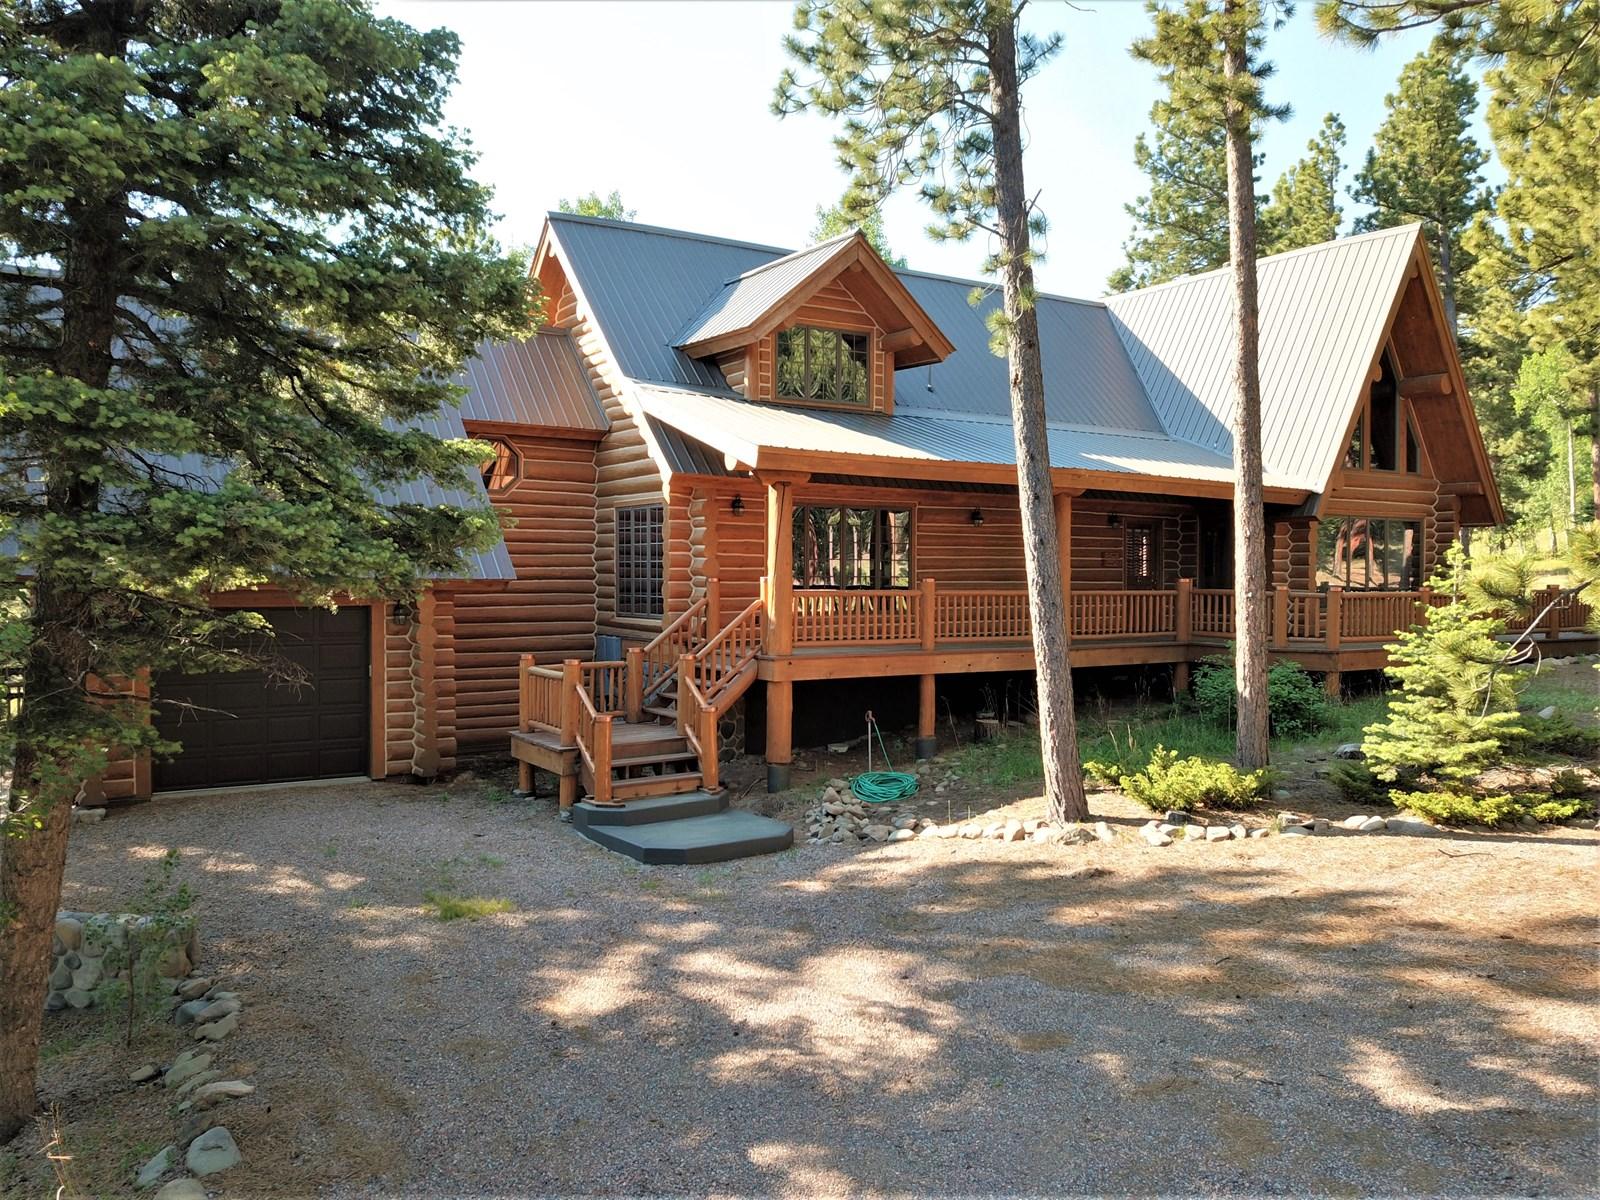 Perfect Mountain Home Getaway in Westcliffe, Colorado